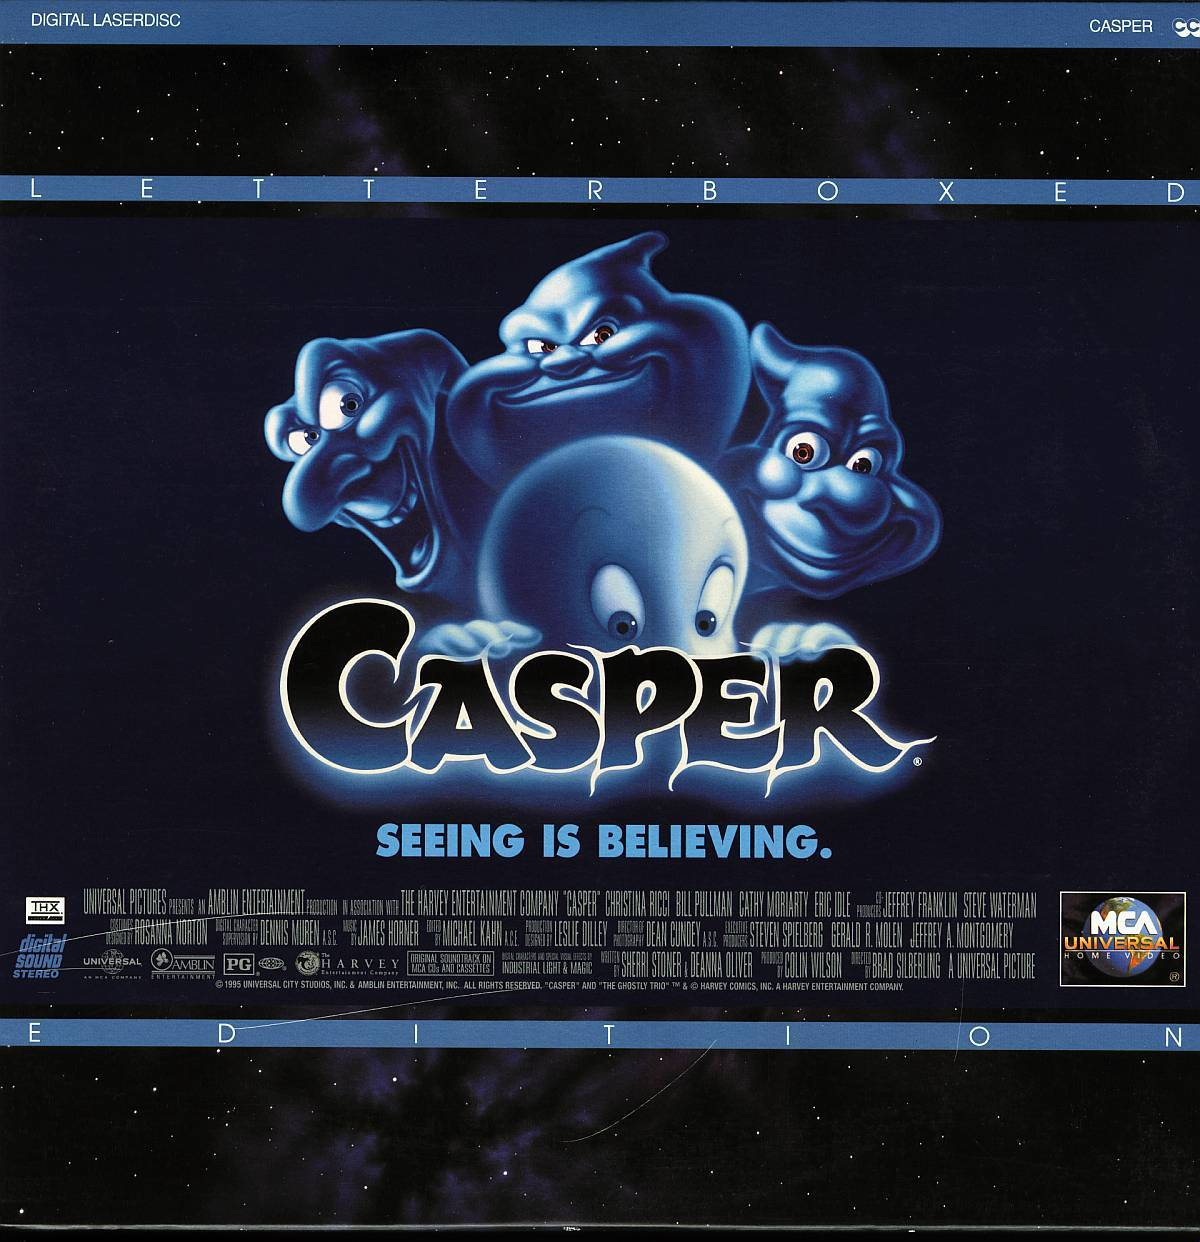 CASPER LTBX CATHY MORIARTY  LASERDISC RARE